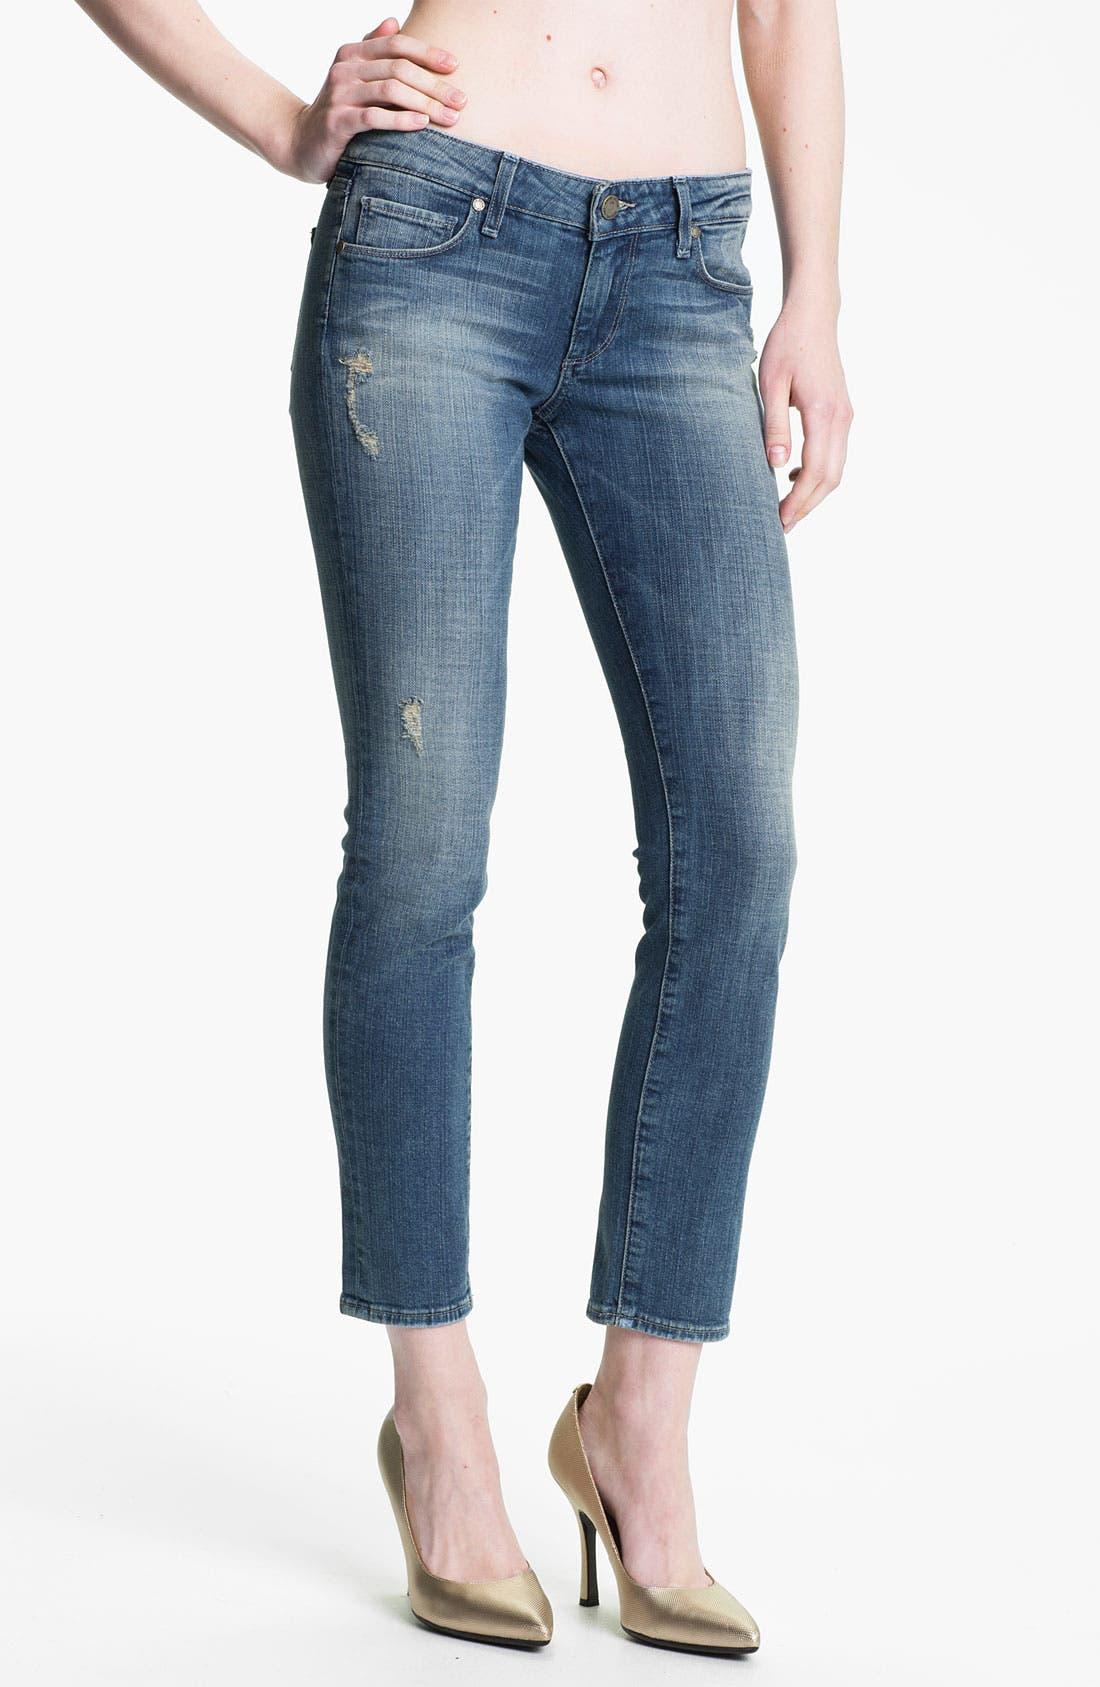 Alternate Image 1 Selected - Paige Denim 'Skyline' Ankle Peg Skinny Stretch Jeans (Sadie)